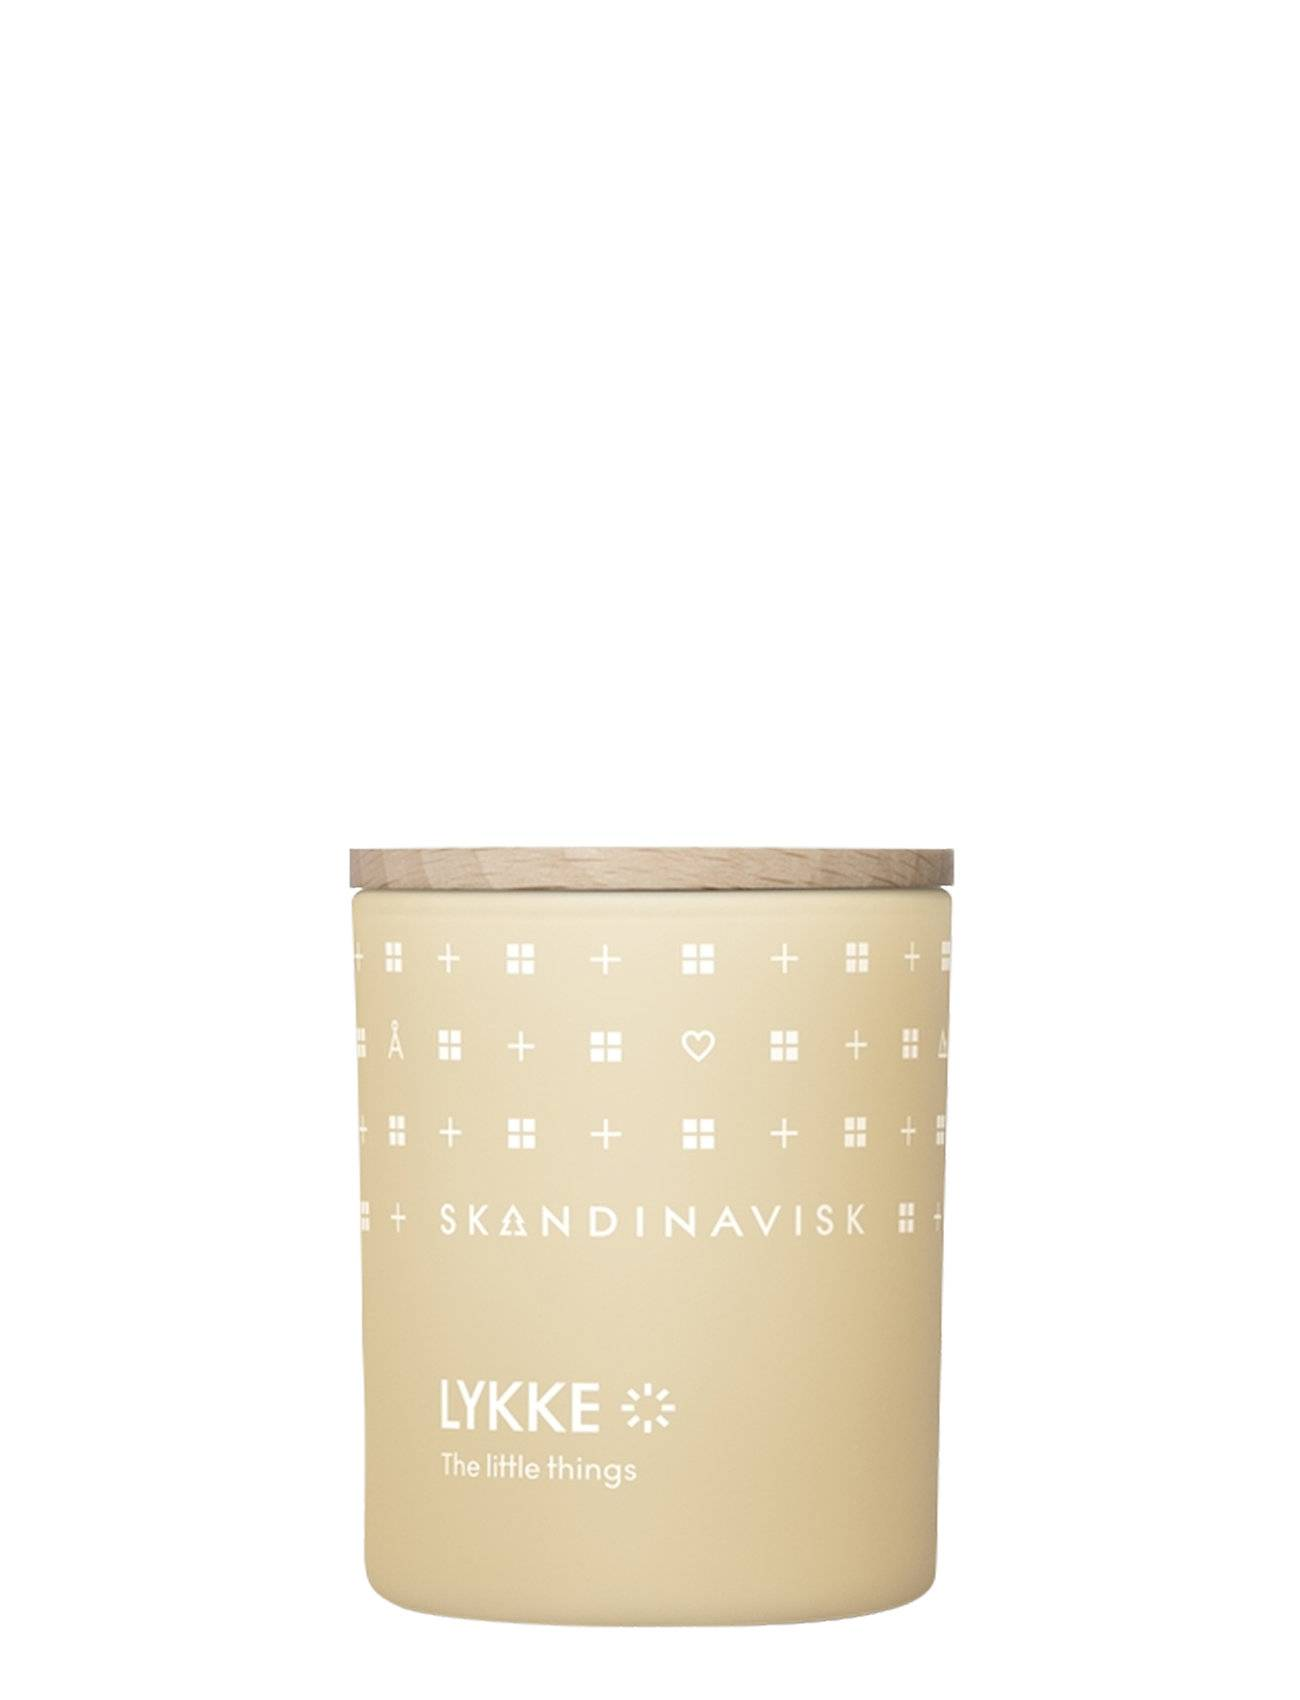 Skandinavisk Lykke Scented Candle With Lid 65g Tuoksukynttilä Nude Skandinavisk